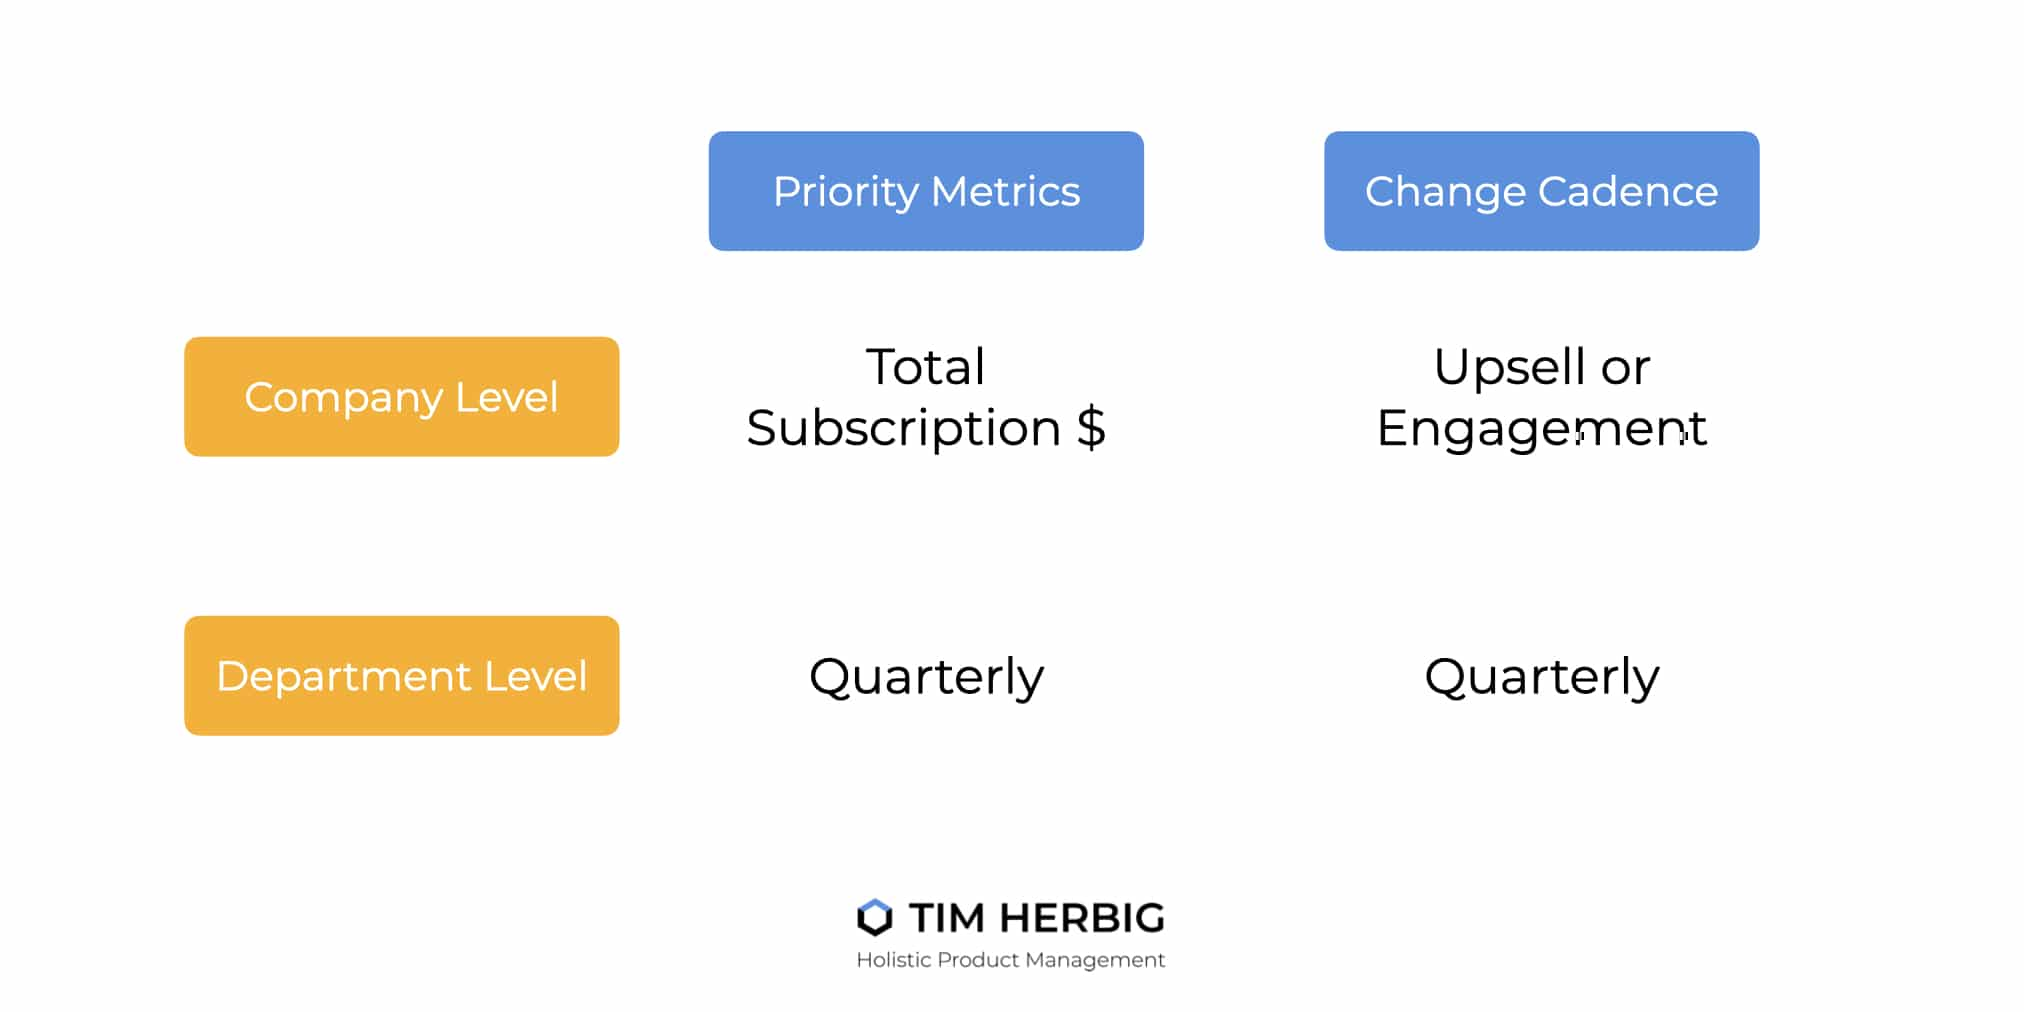 Company Levels and Priority Metrics